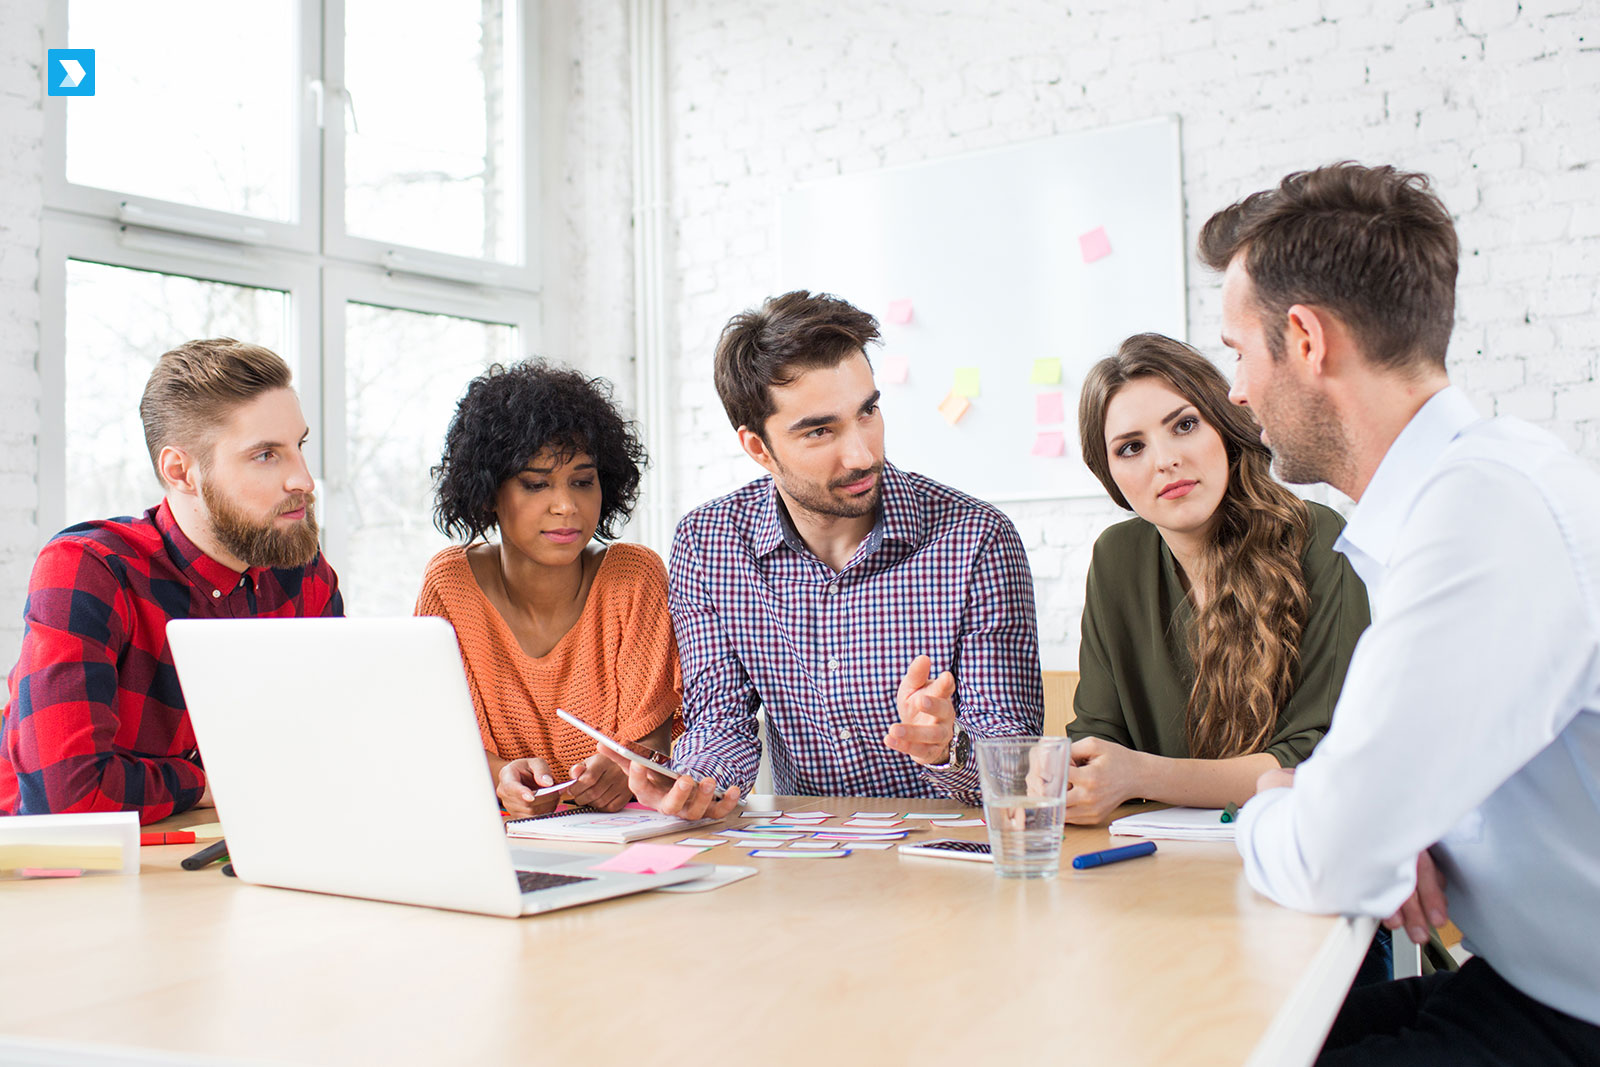 The Anatomy of a Digital Marketing Agency